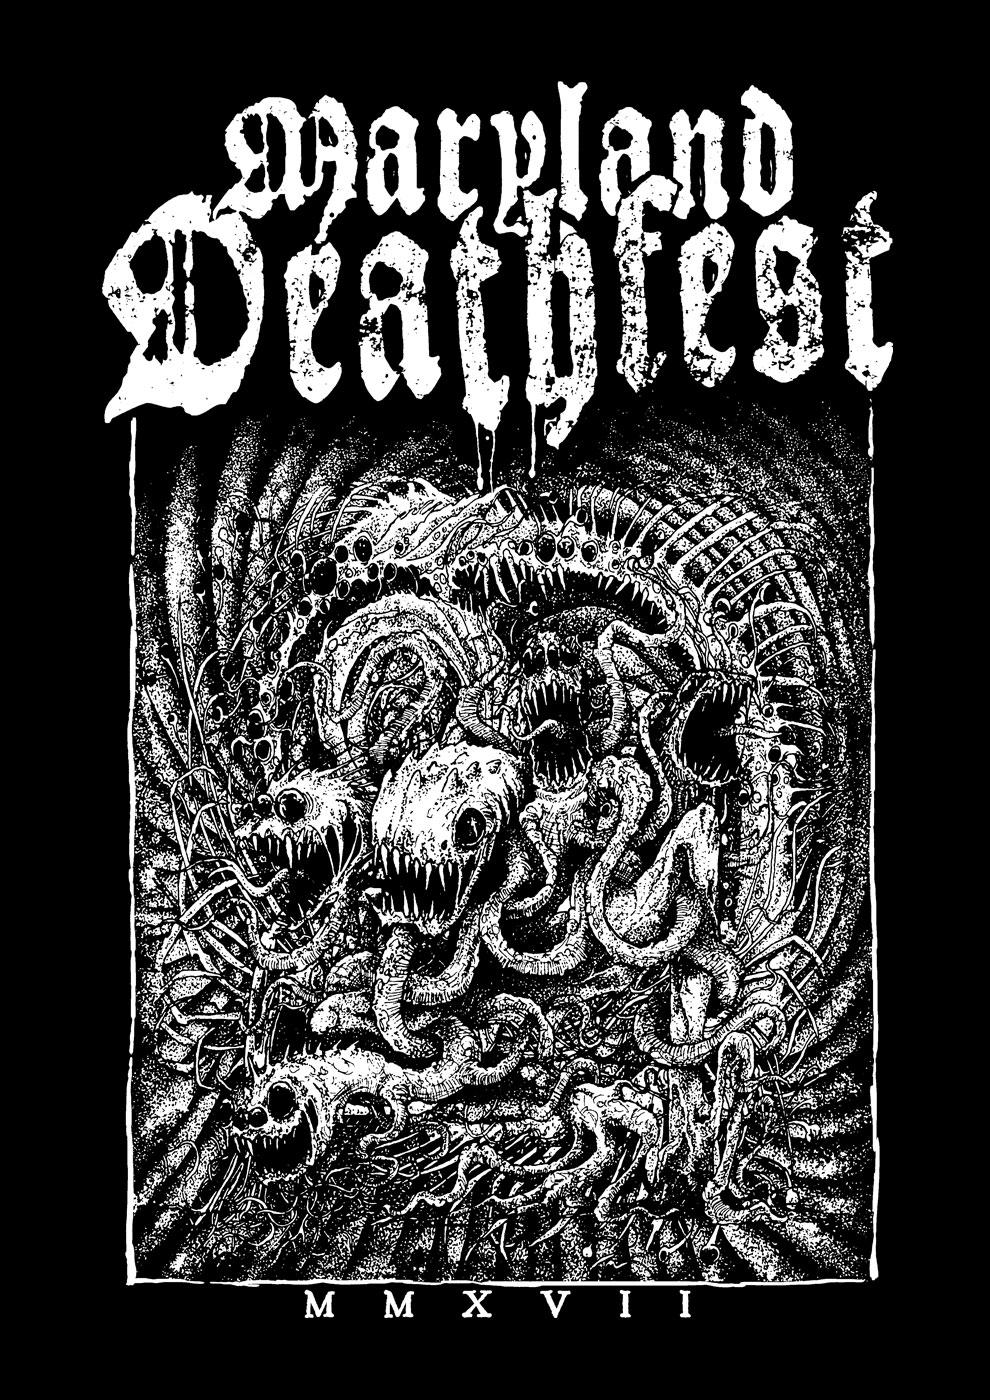 Shirt Design for MARYLAND DEATHFEST 2017